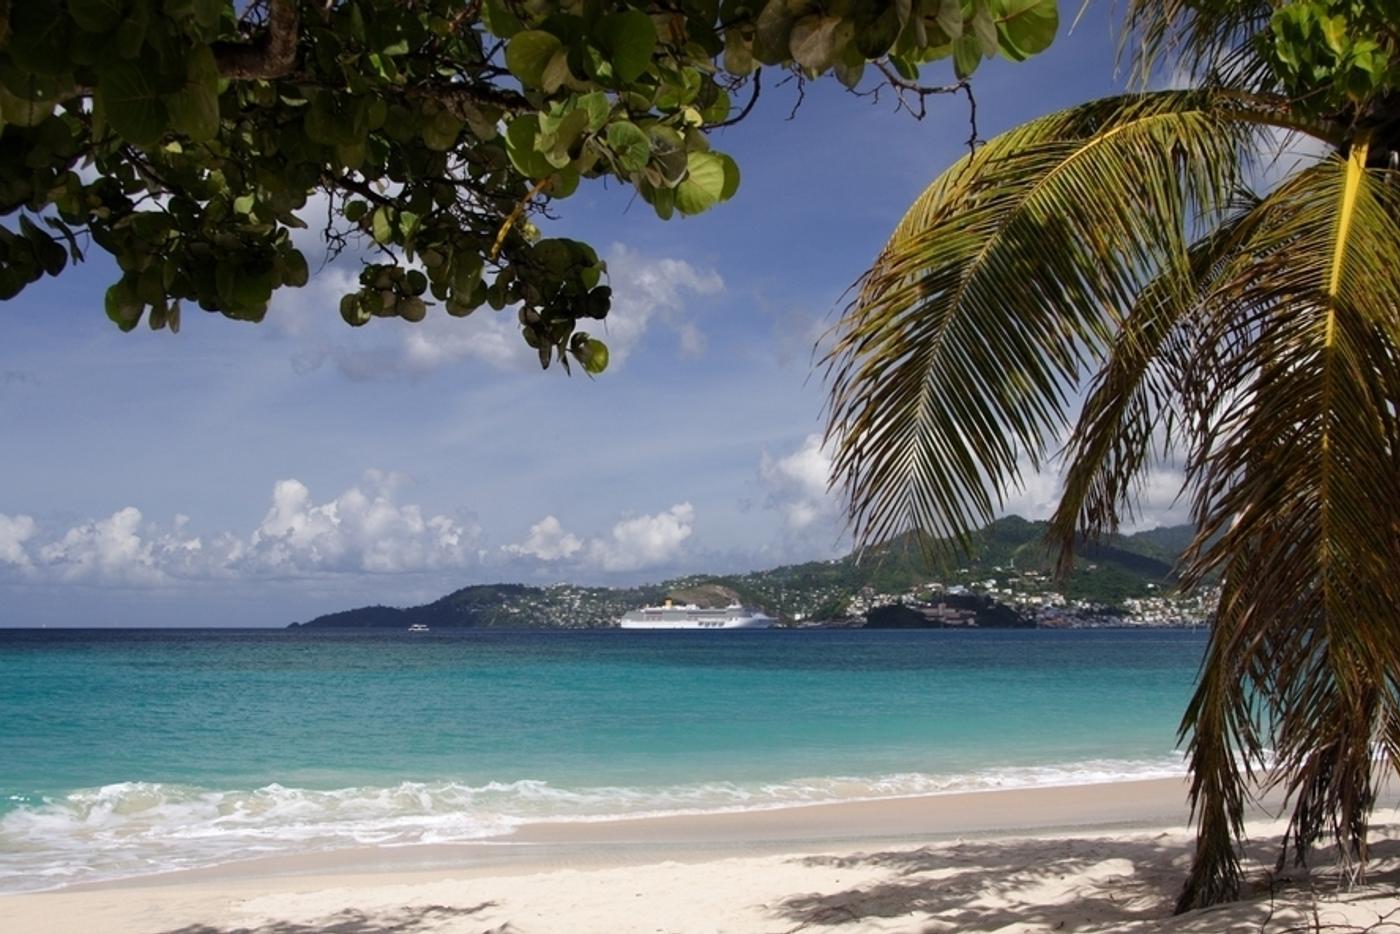 Sandy beach with single trees